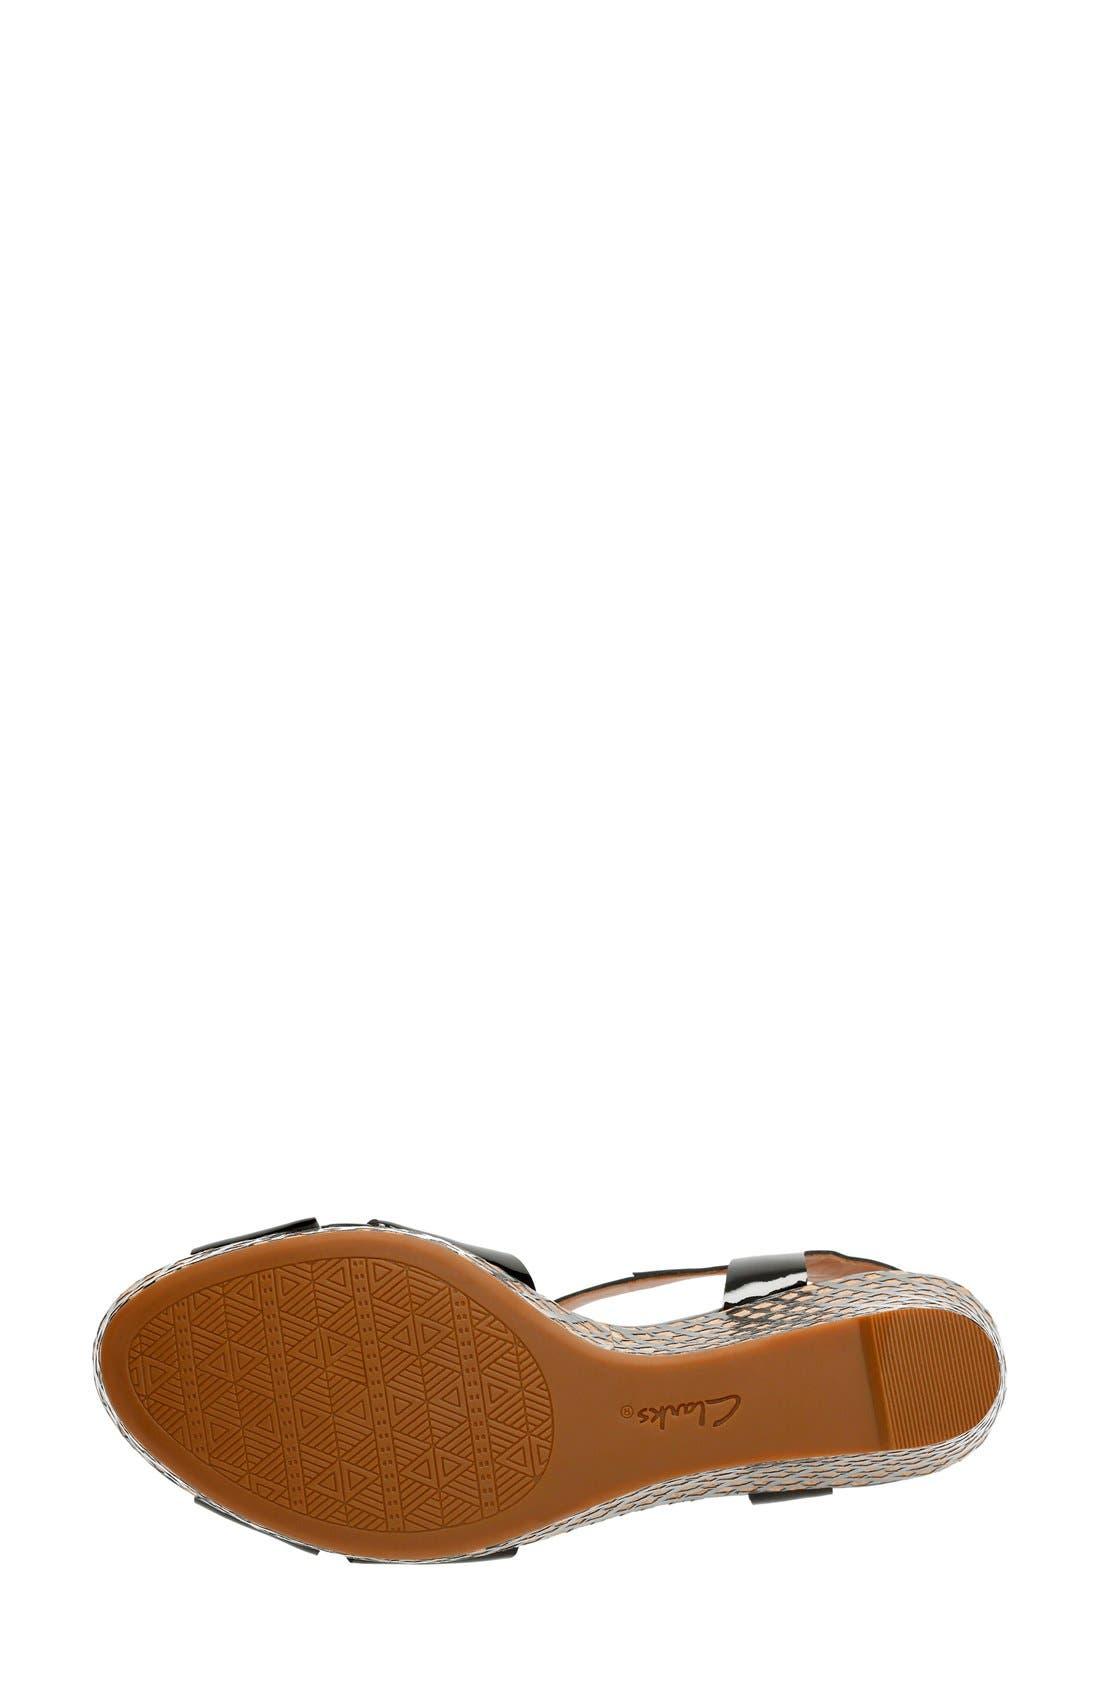 'Amelia Roma' Wedge Sandal,                             Alternate thumbnail 4, color,                             017